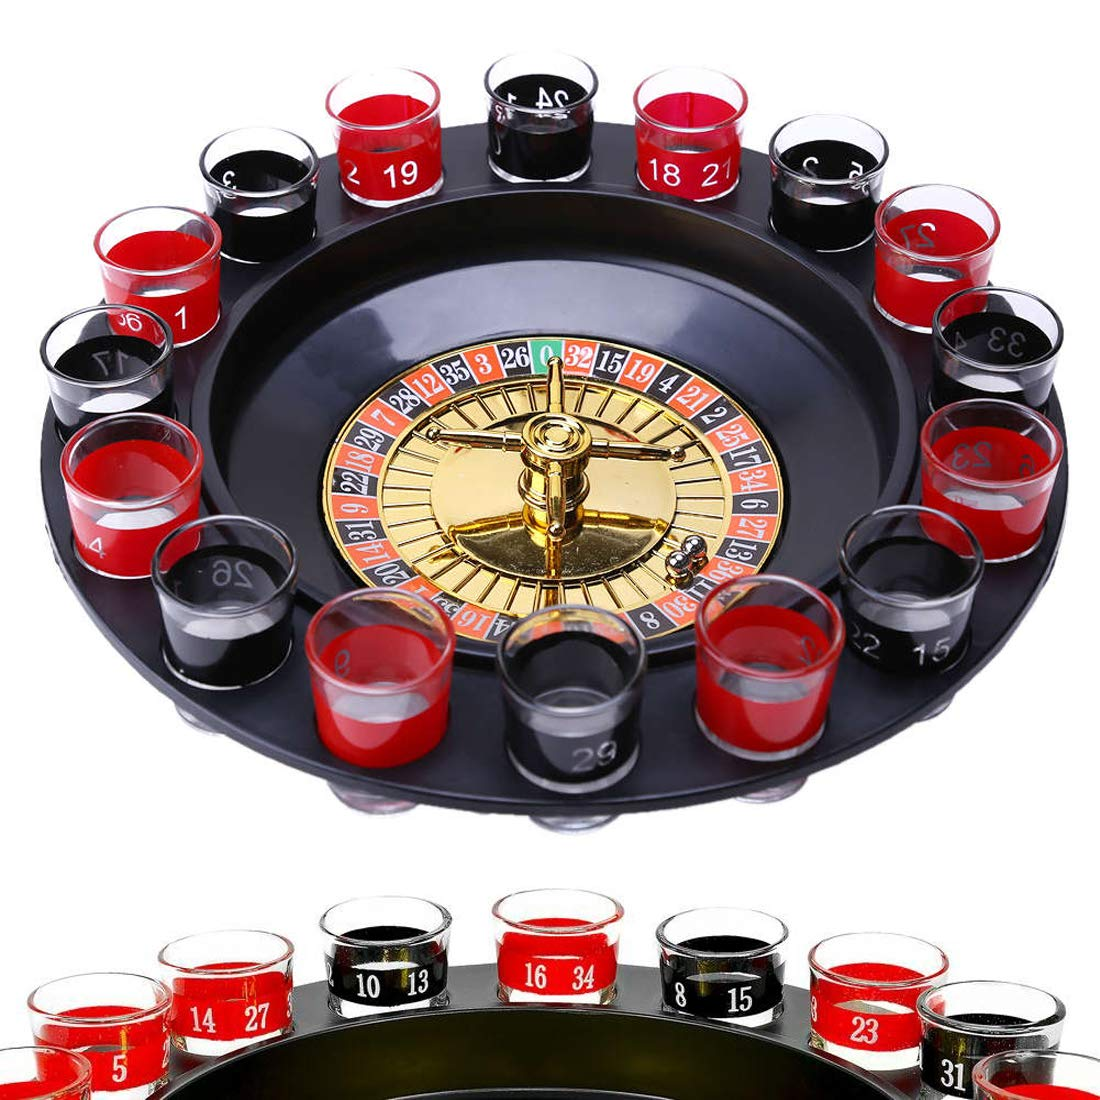 Bally's roulette slot machine